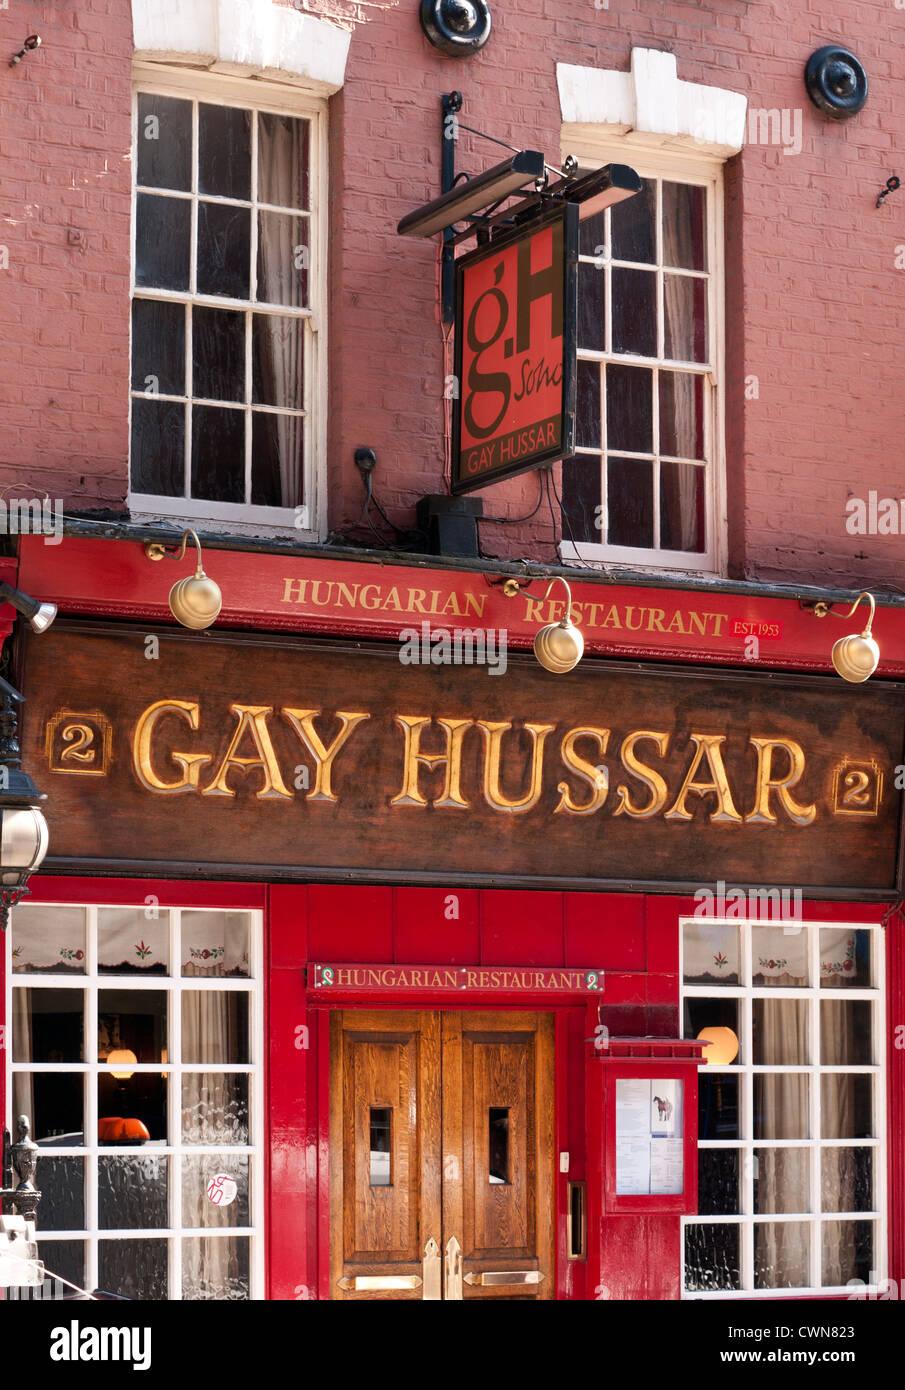 from Julius gay hussar restaurant london